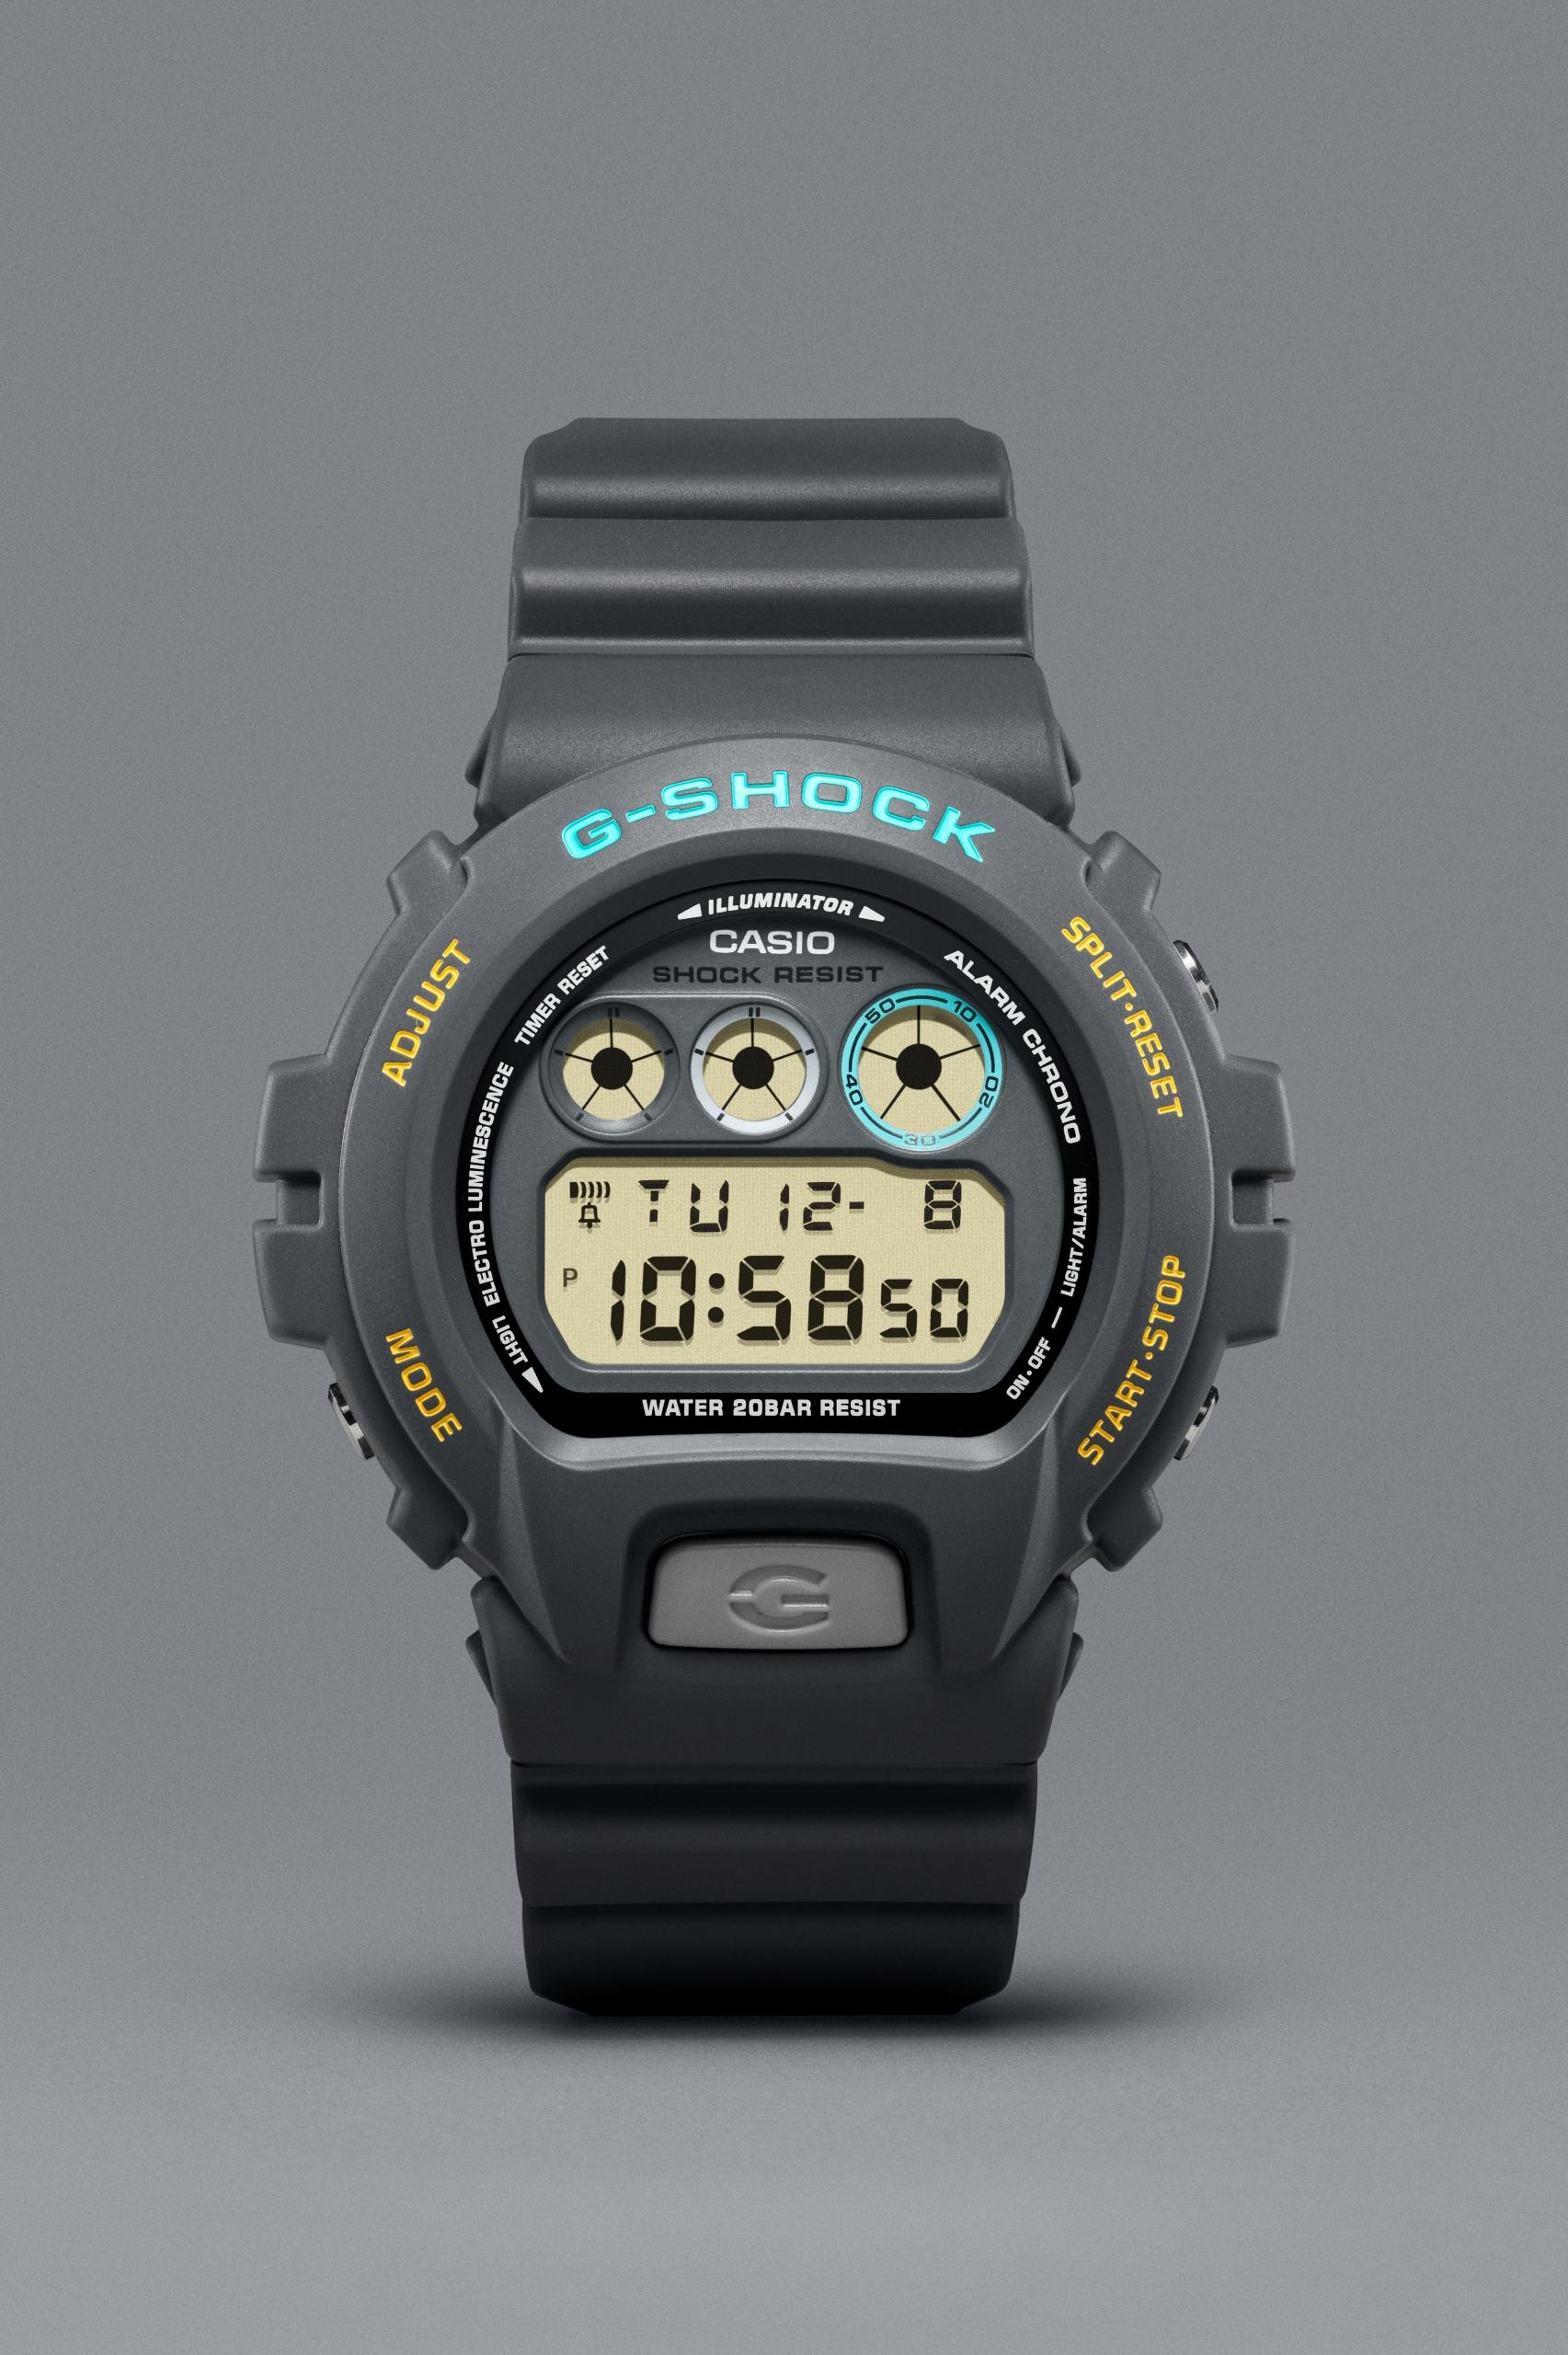 Casio G-Shock x Hodinkee Ref. 6900 John Mayer